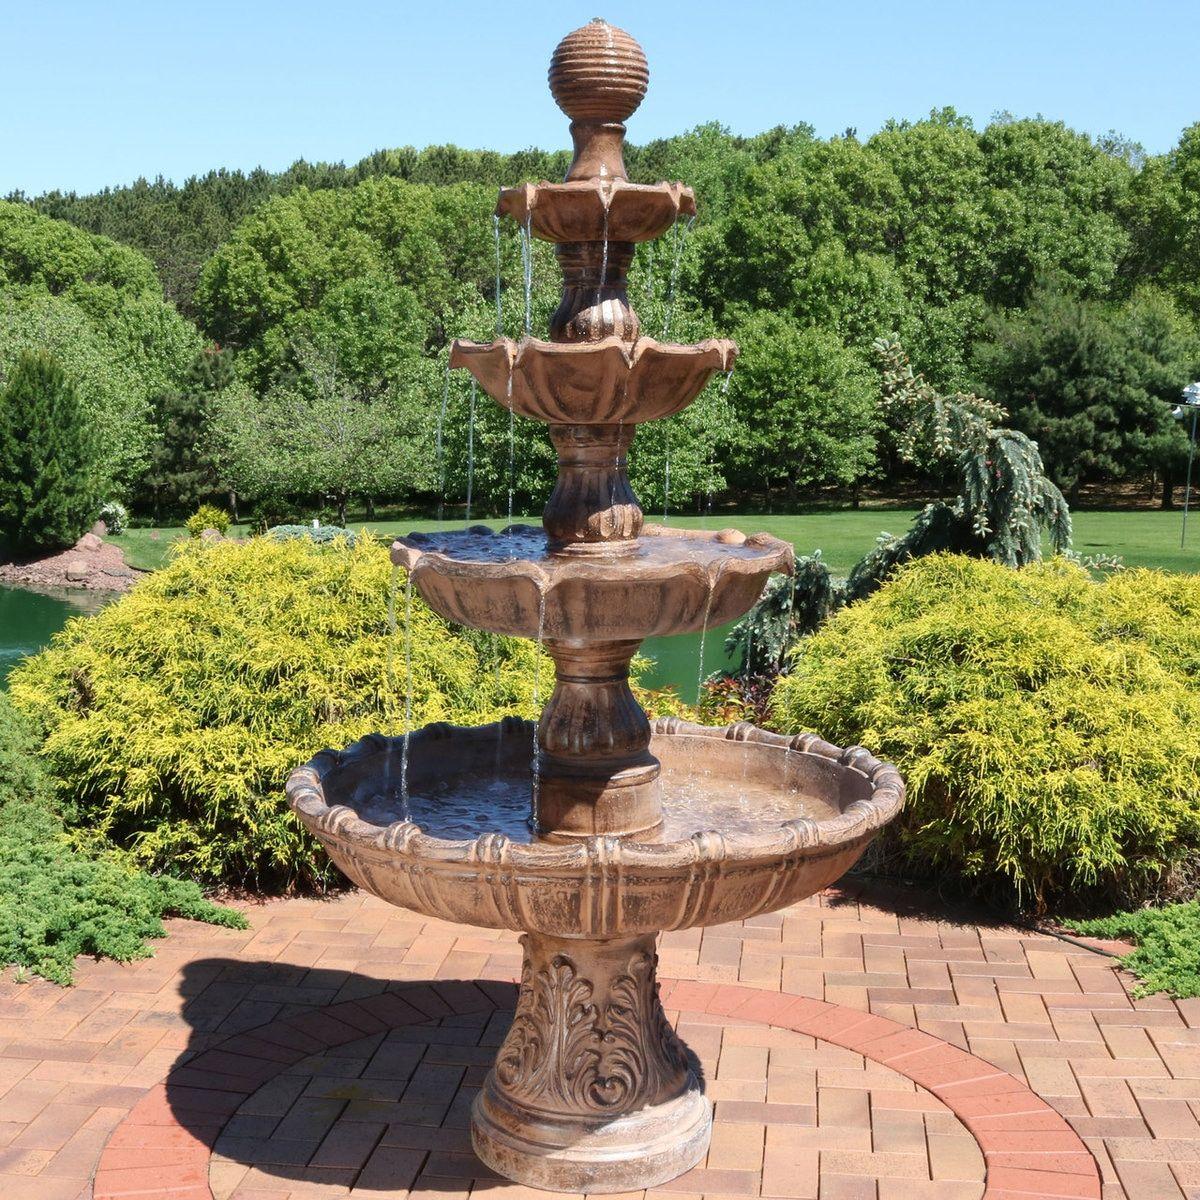 Sunnydaze Large Tiered Ball Outdoor Fountain Garden Water Fountains Fountains Outdoor Water Fountains Outdoor